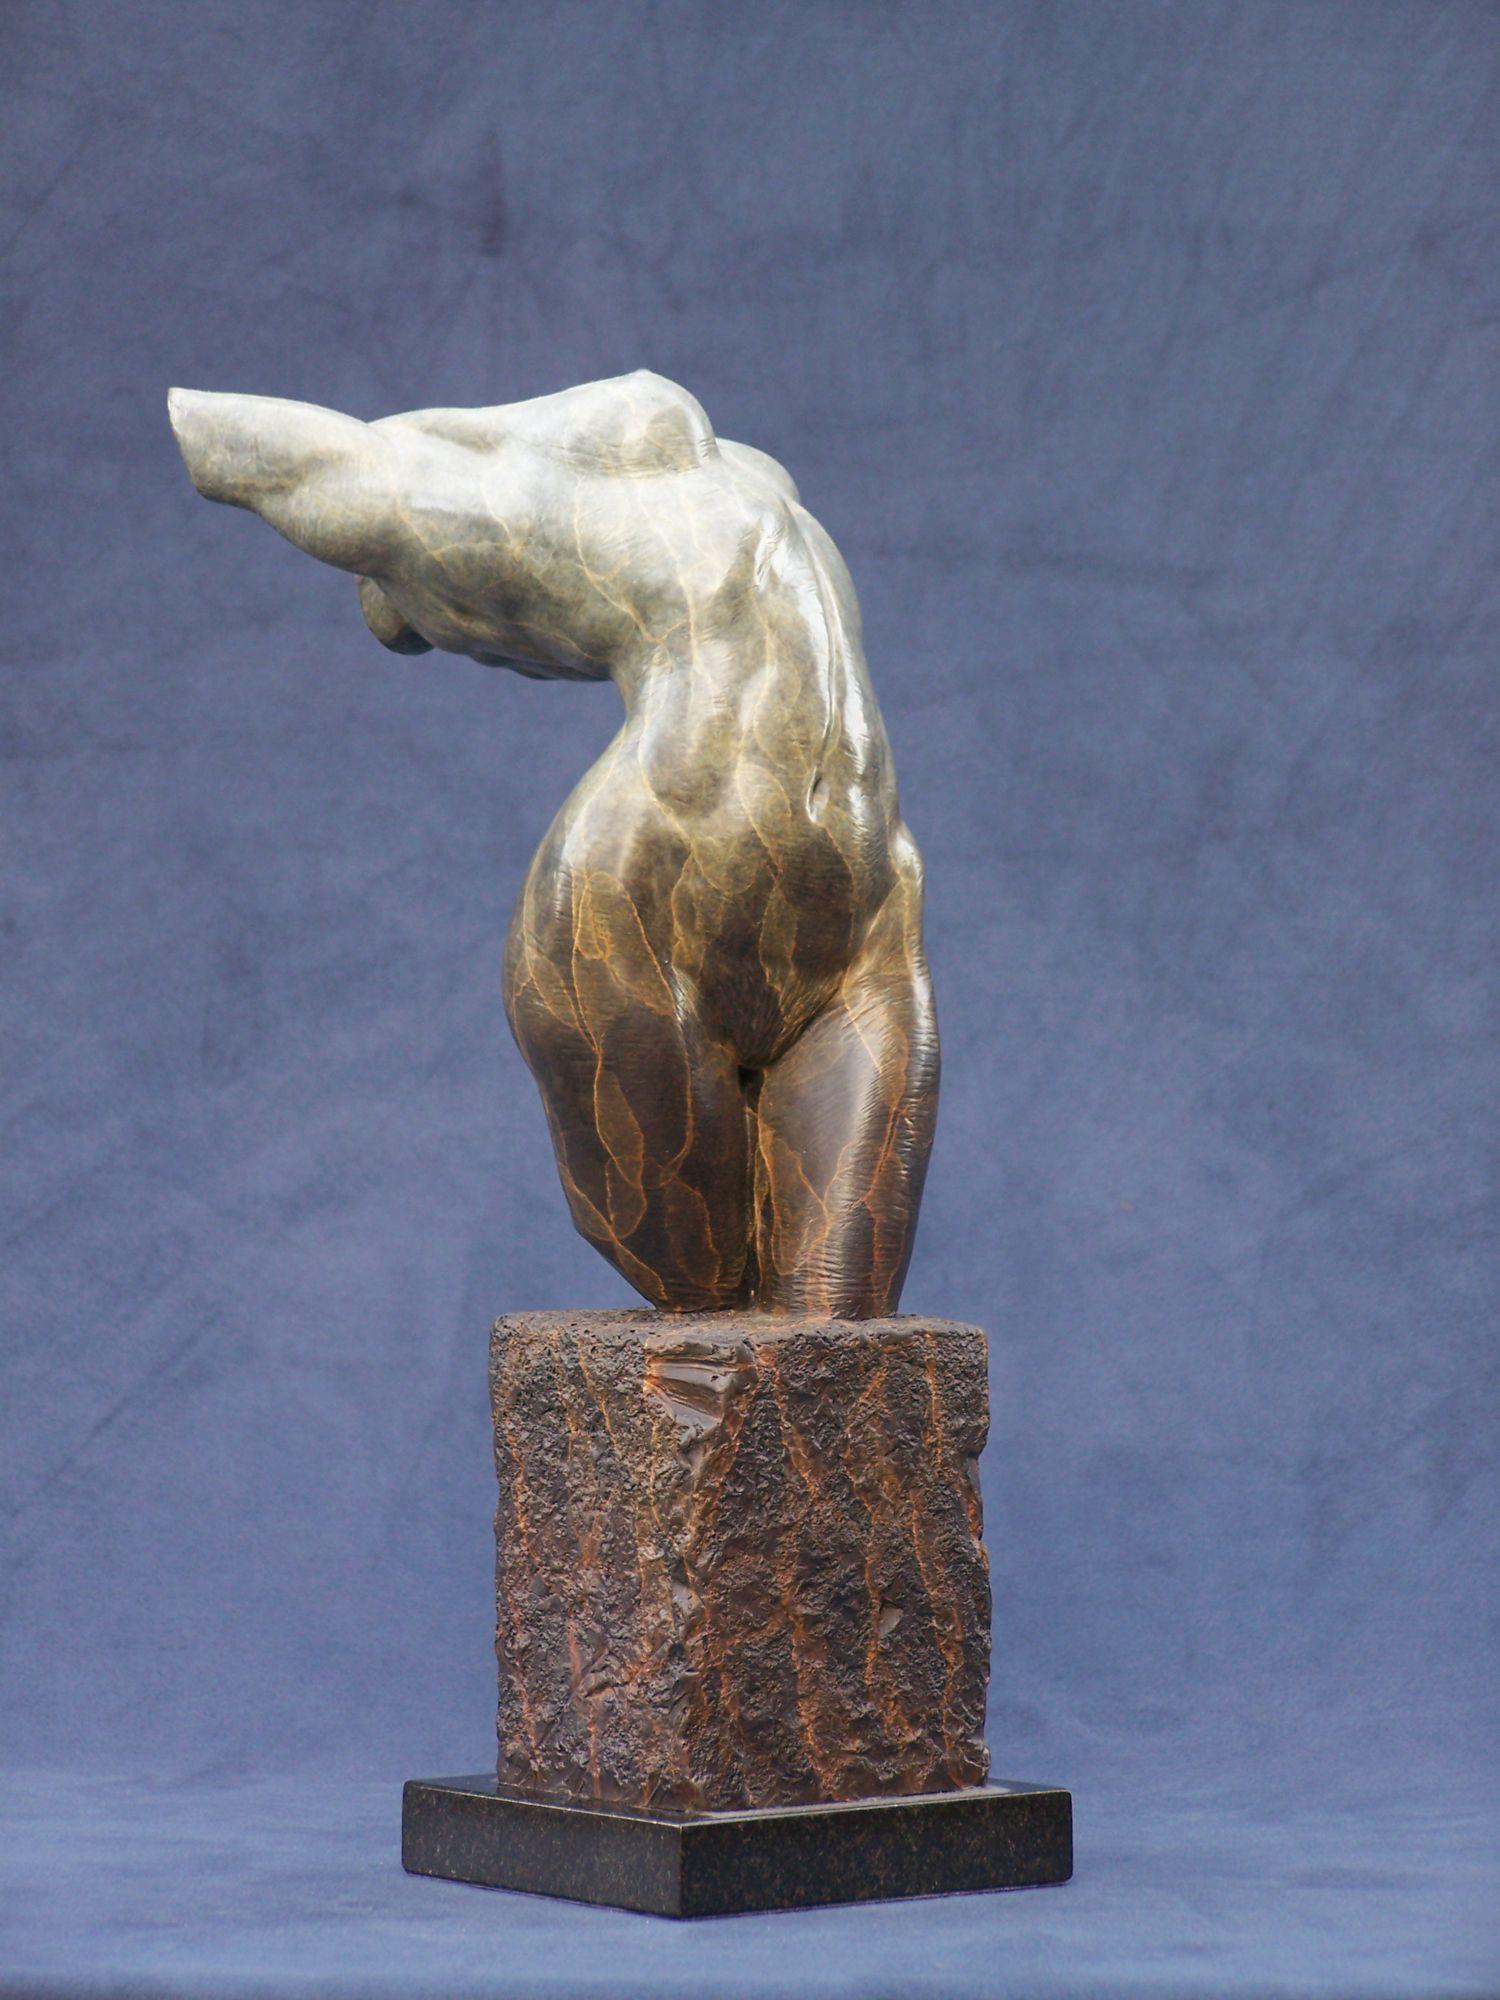 Female nude torso fragment sculptures carving inspiration